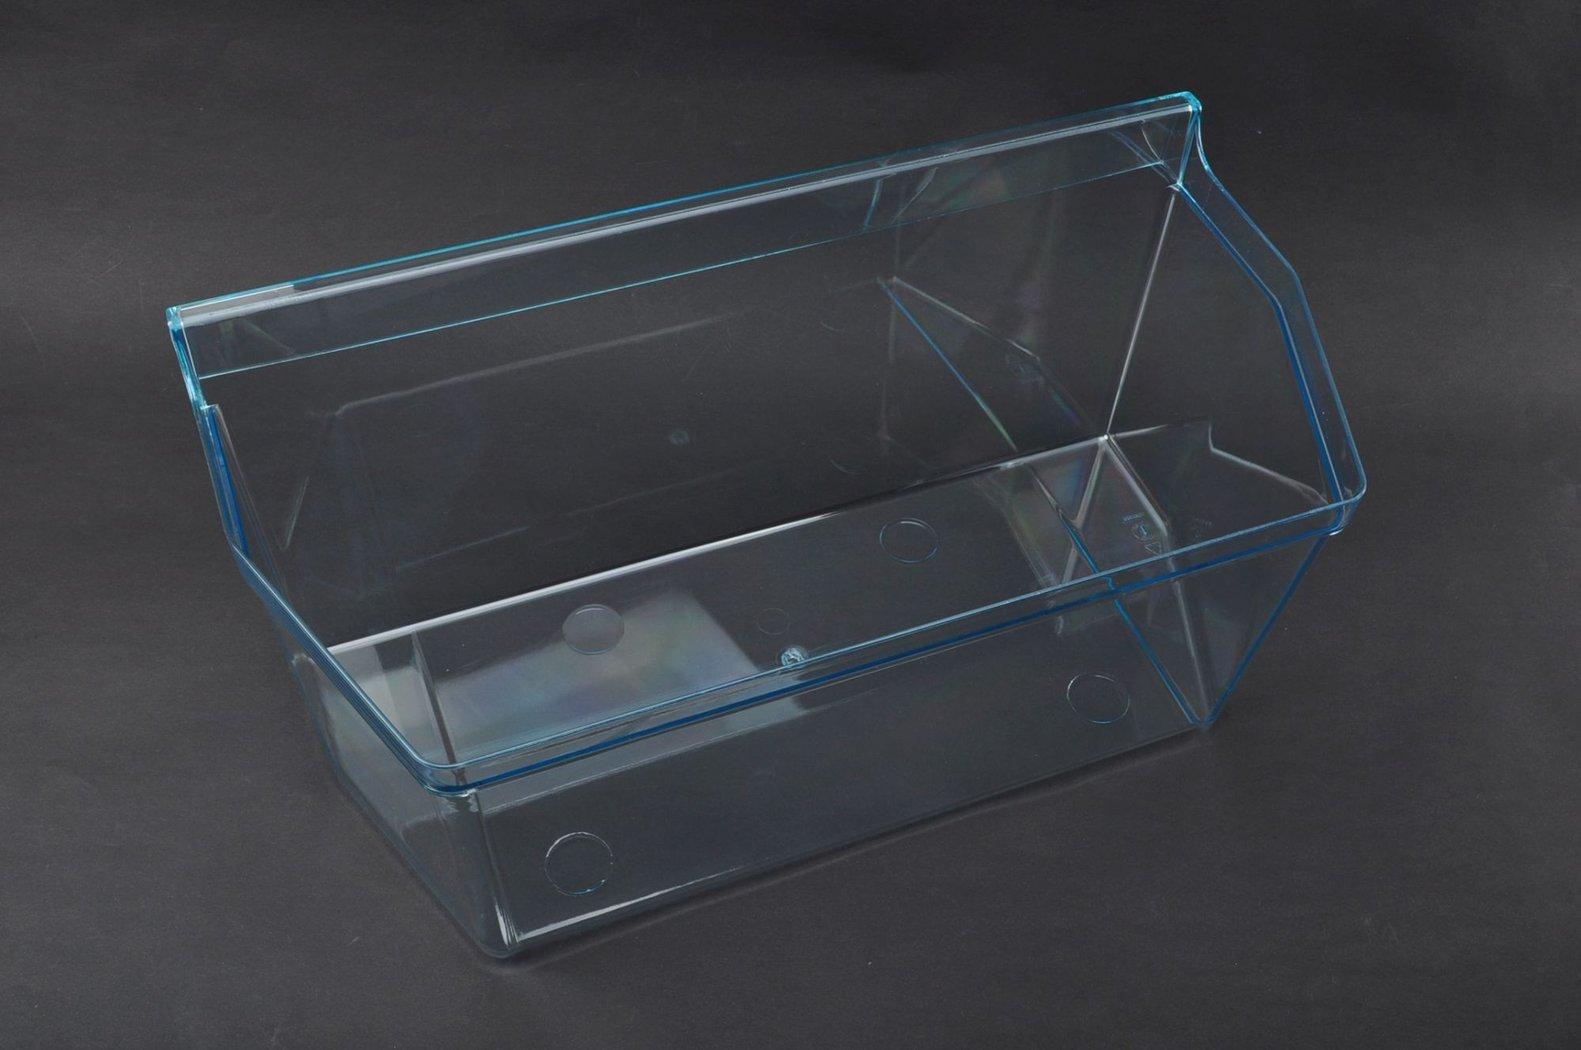 Aeg Kühlschrank Schublade : Gemüseschale schublade aeg privileg kühlschrank u.v.a 2060491426